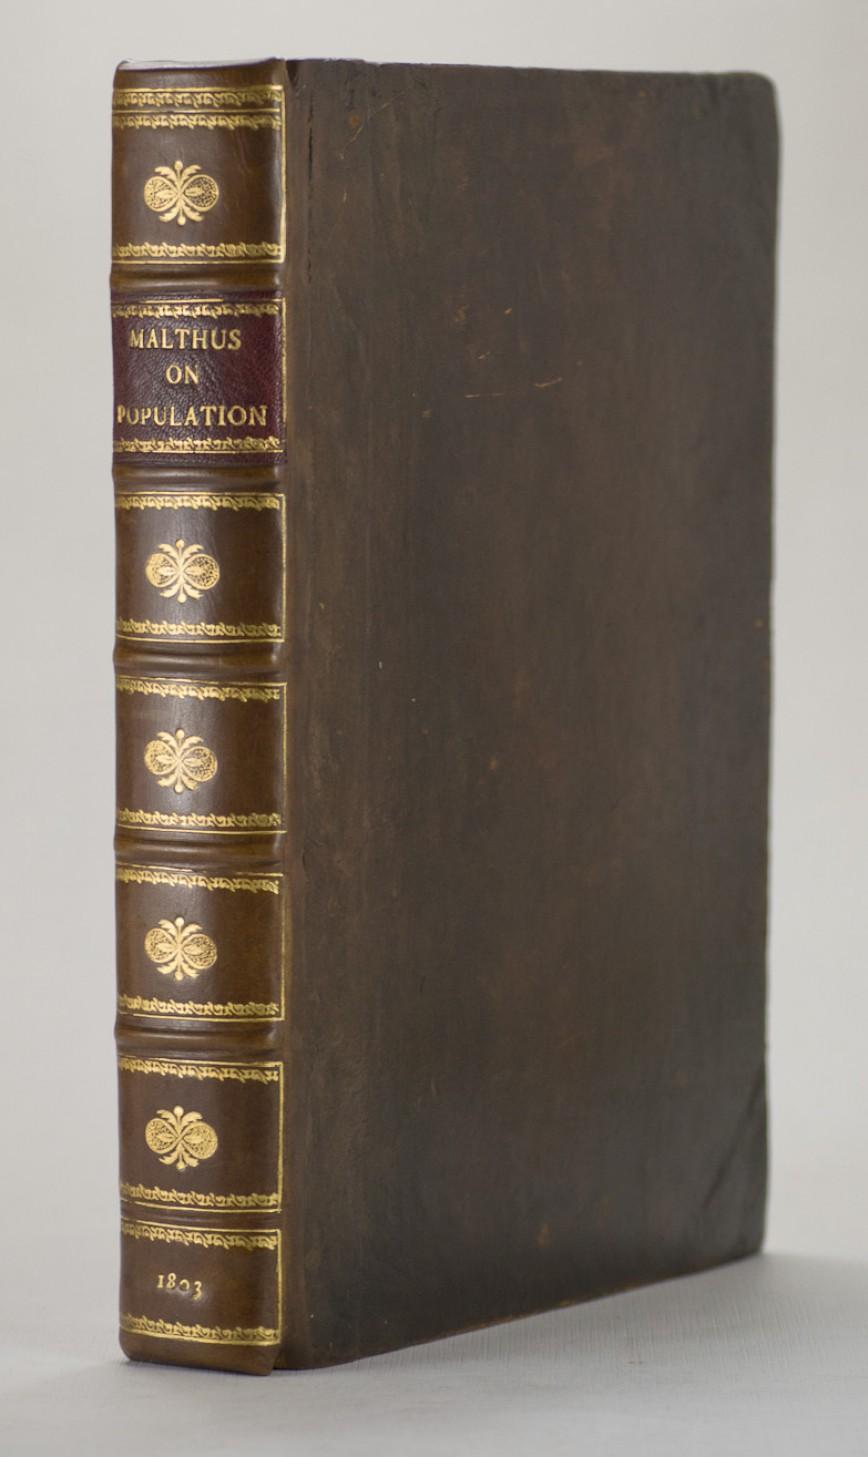 020 65276 1 Essay Example On The Principle Of Singular Population Malthus Sparknotes Thomas Main Idea 868